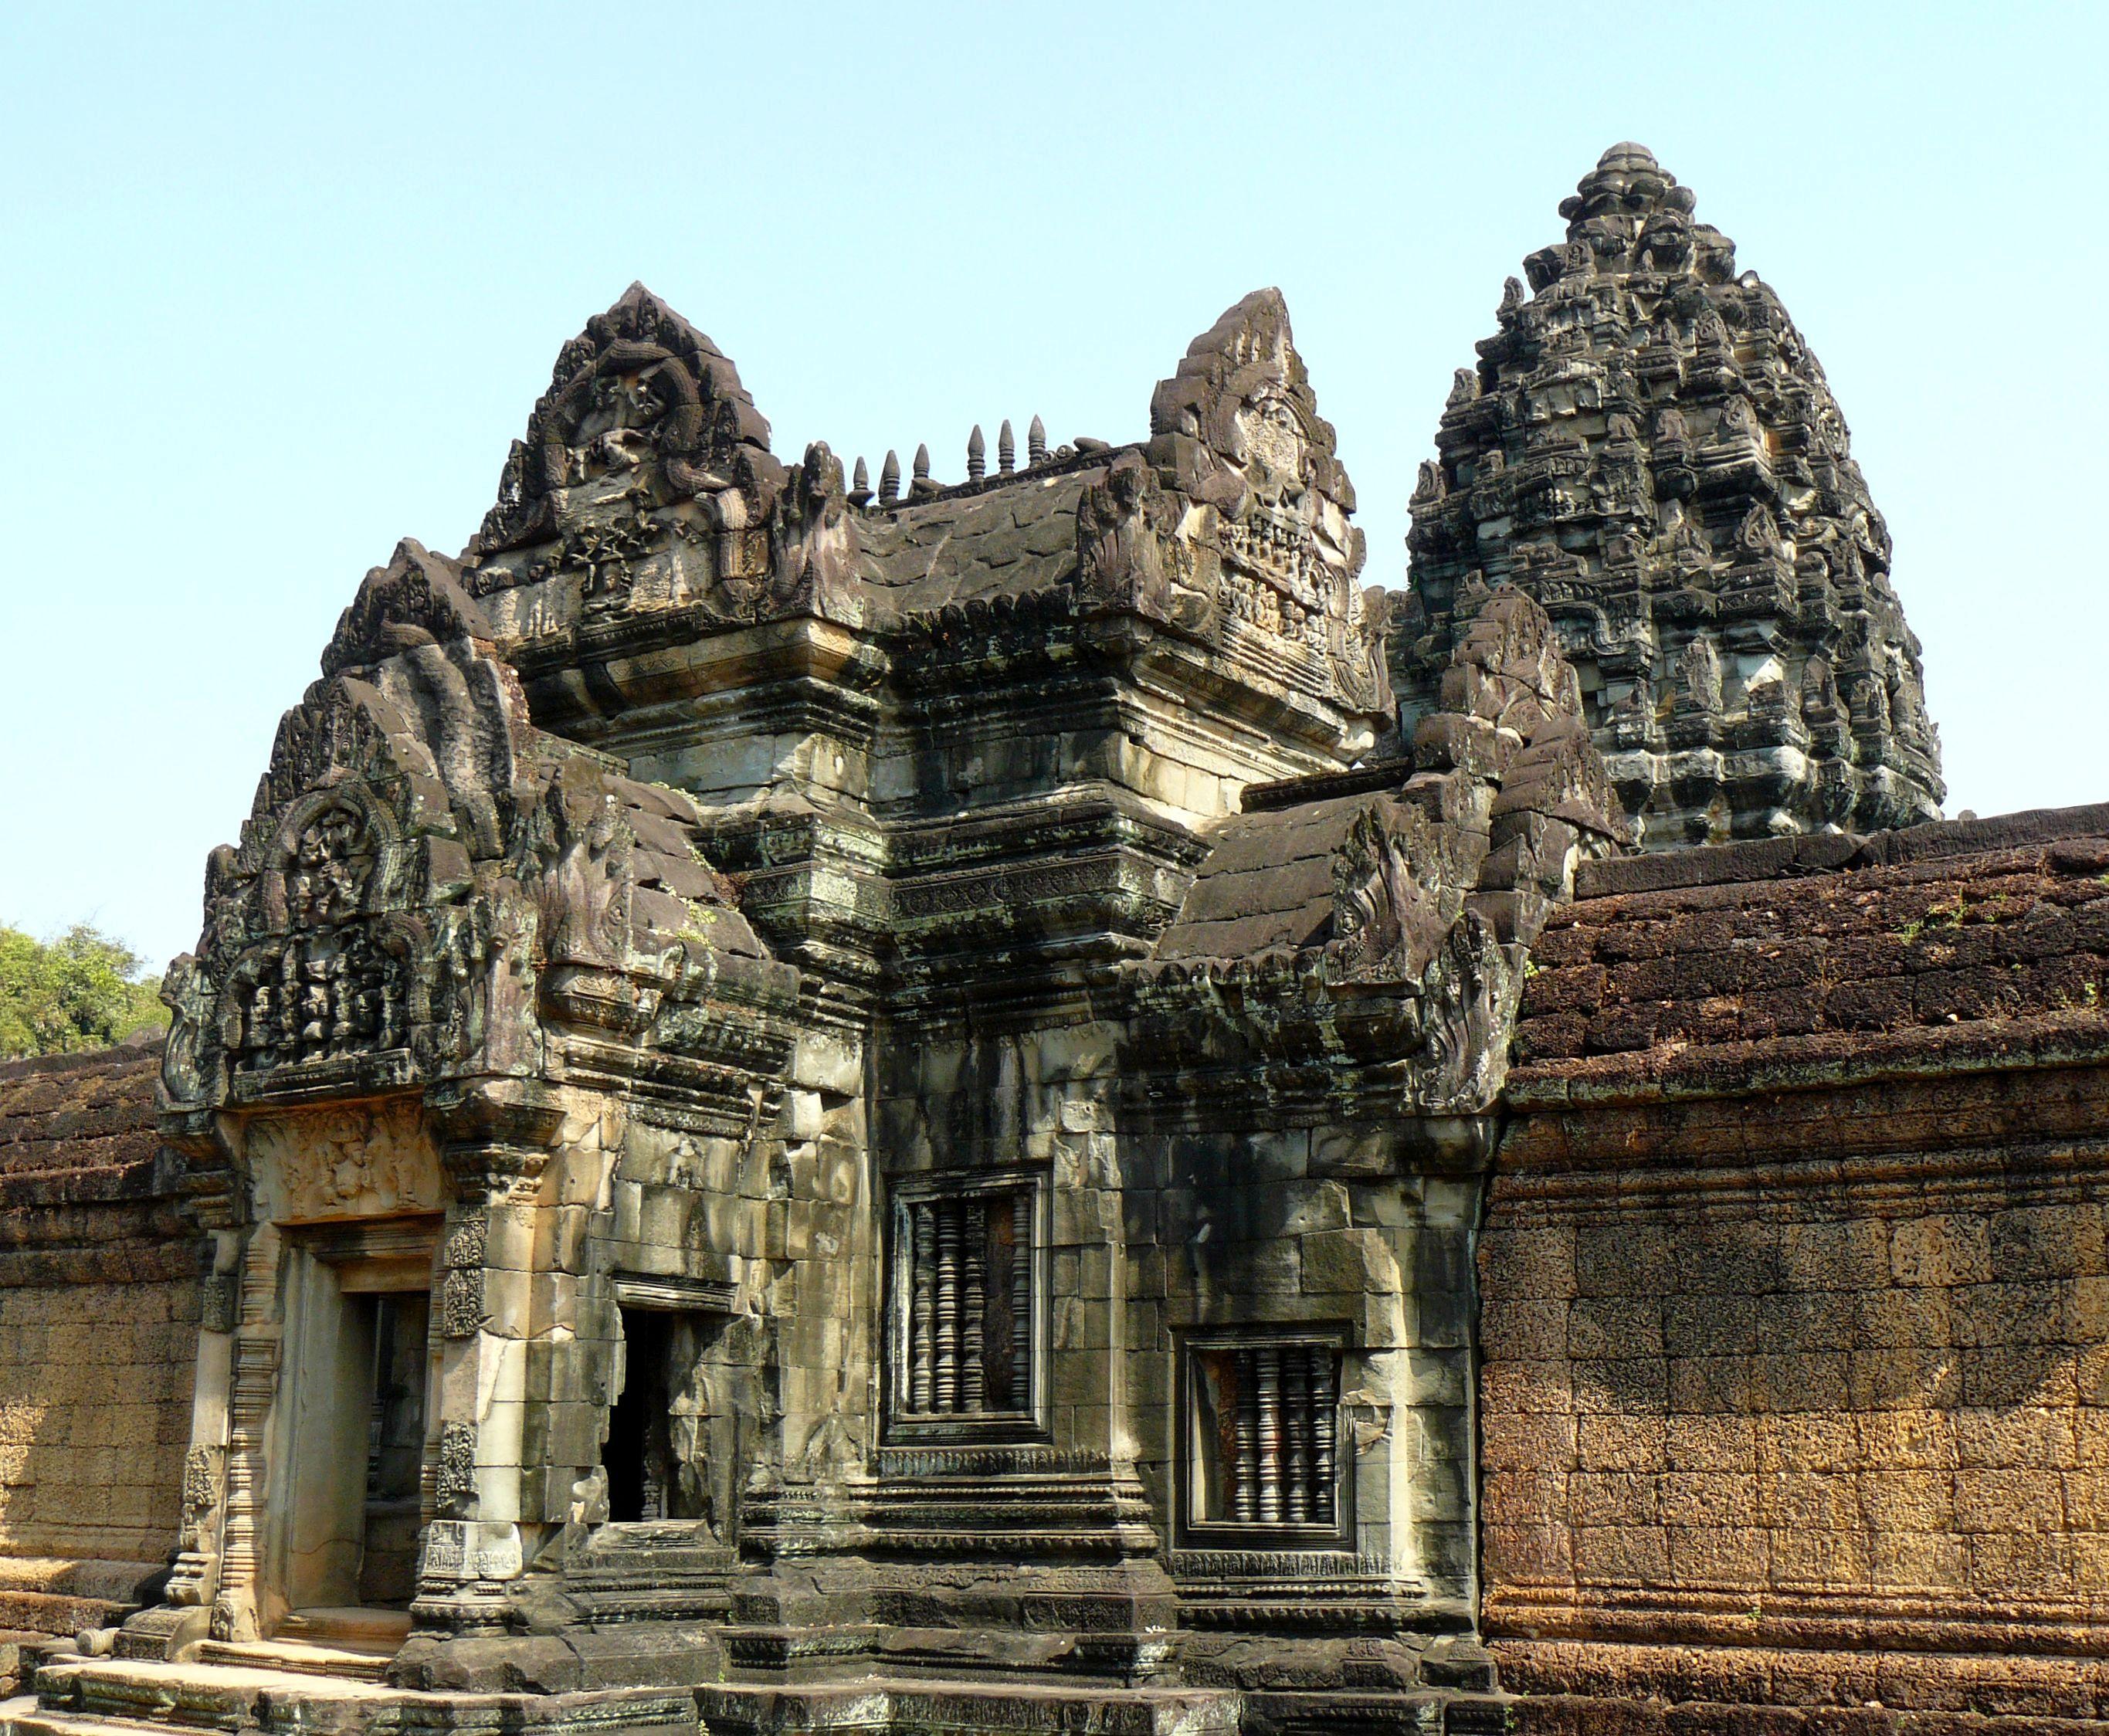 Banteay_Samre,_Cambodia_(2211425643)